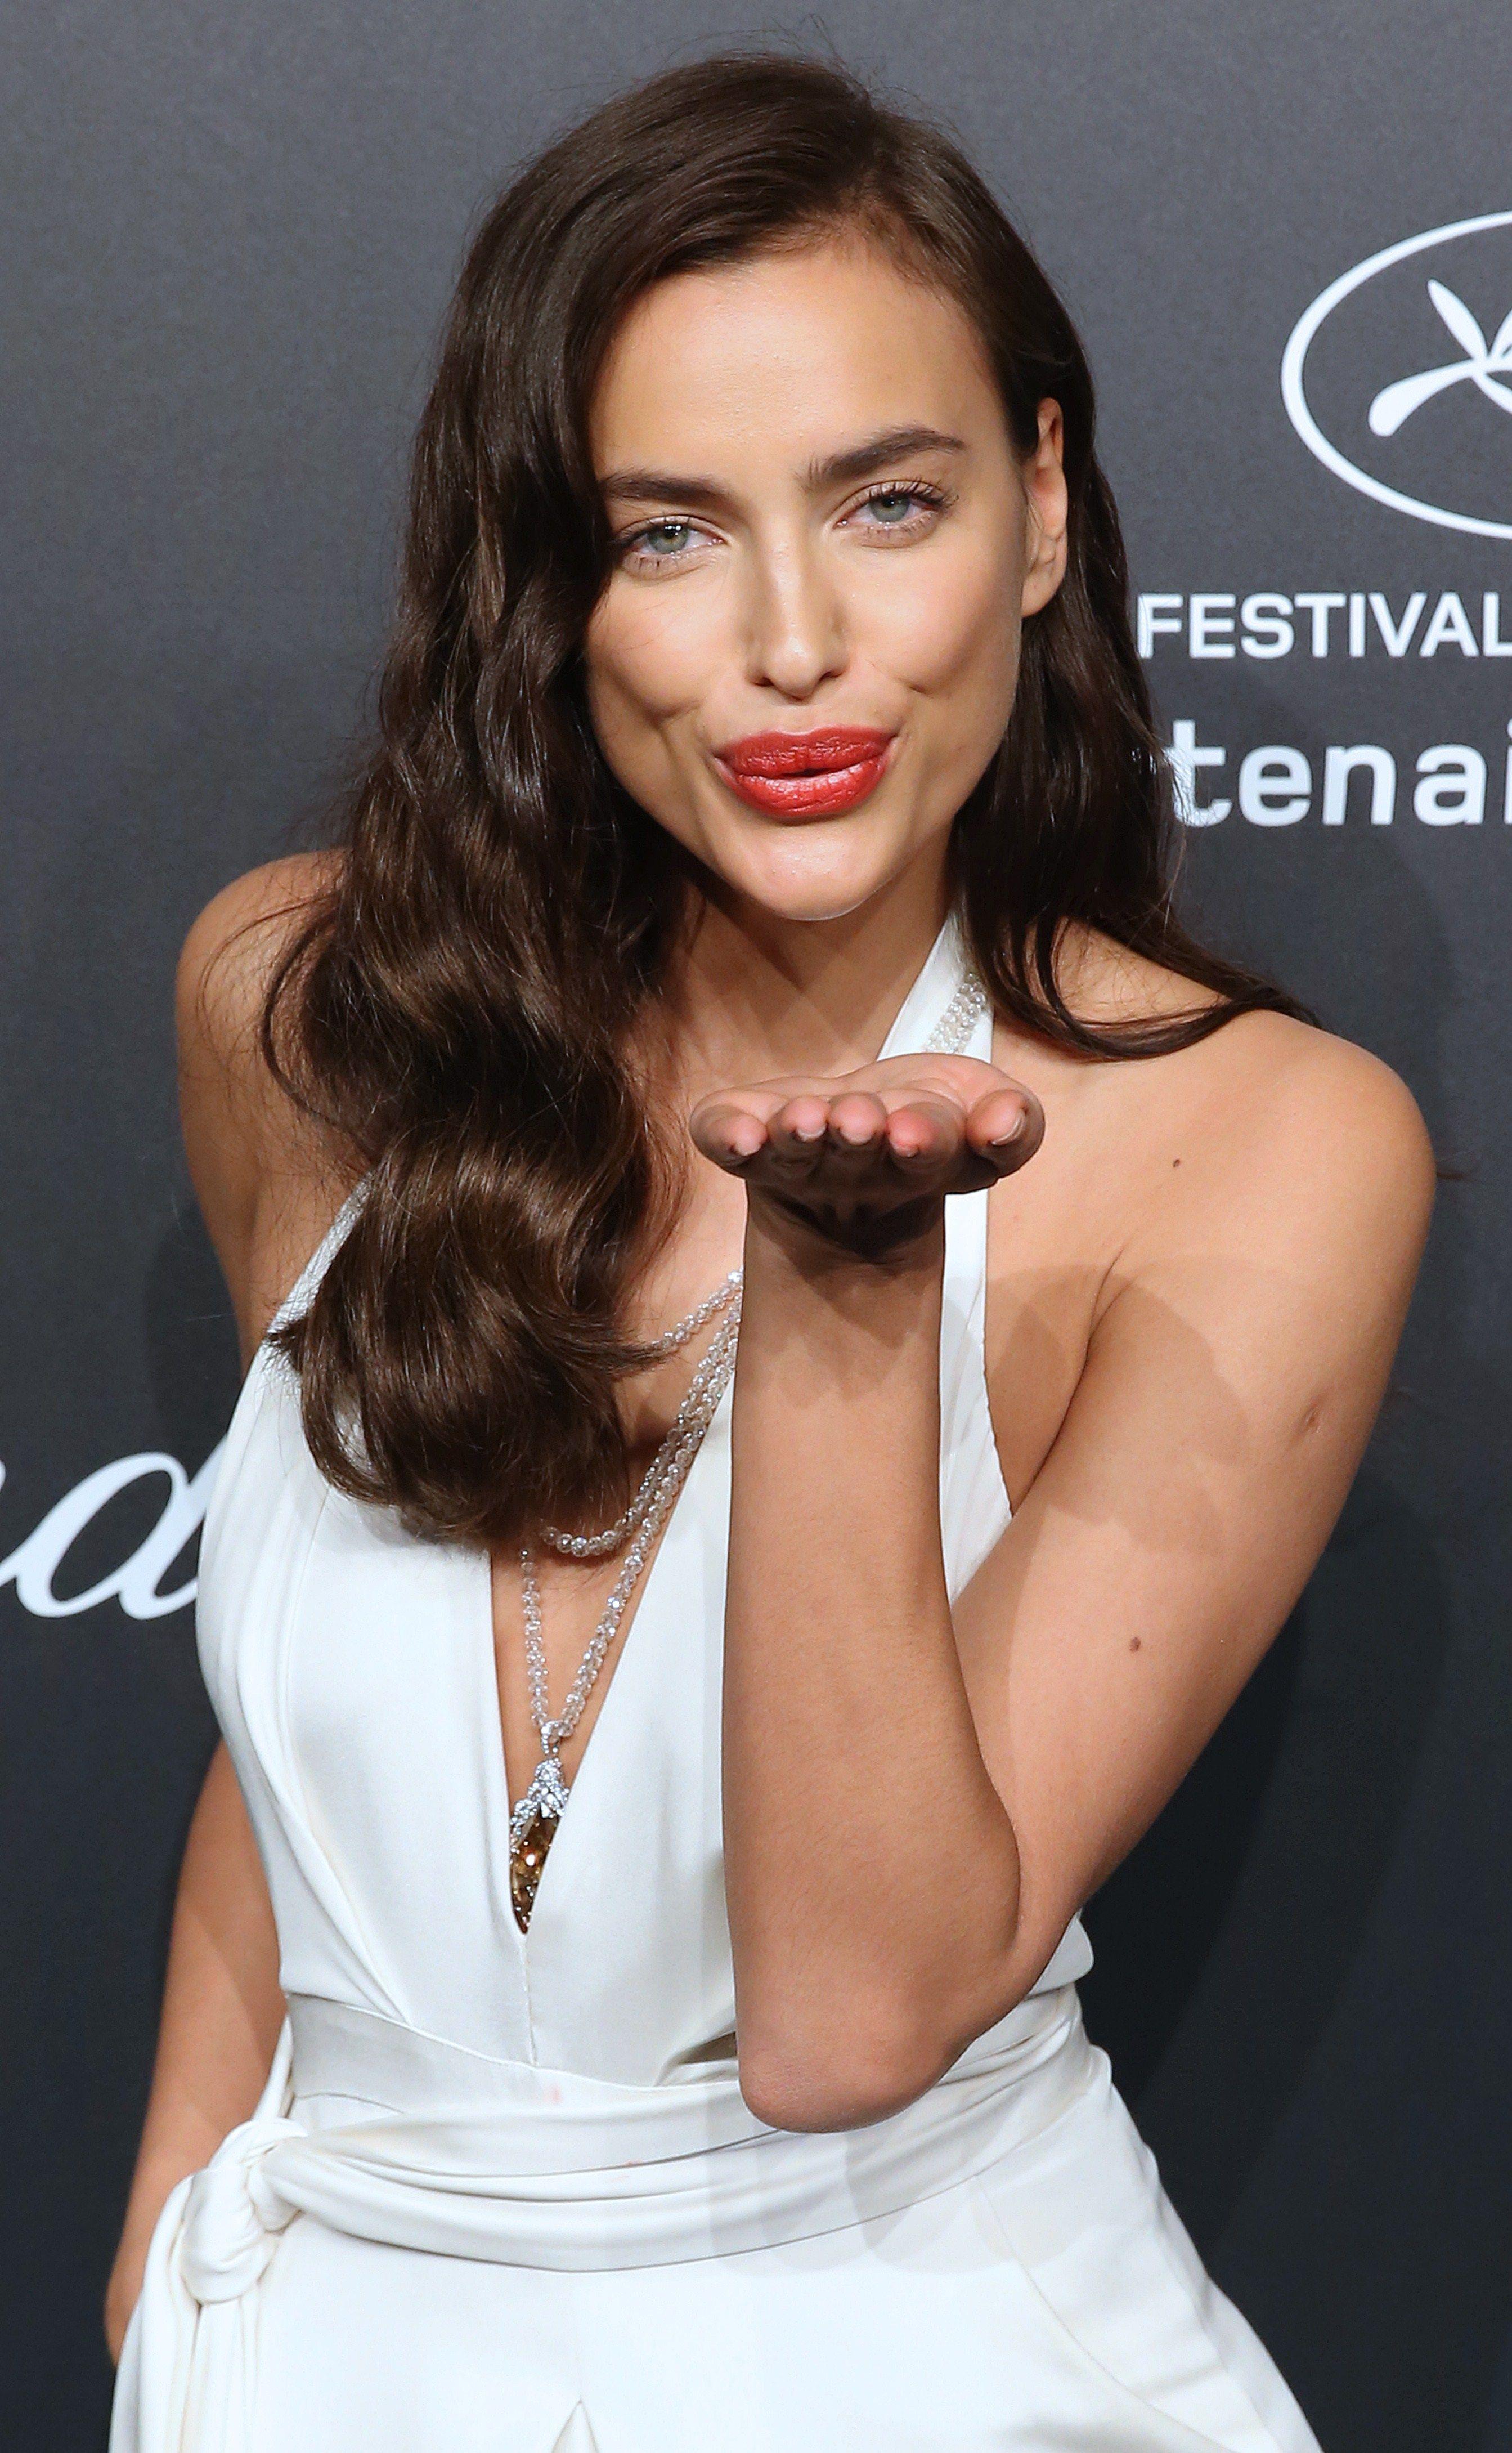 Hacked Irina Shayk nude photos 2019